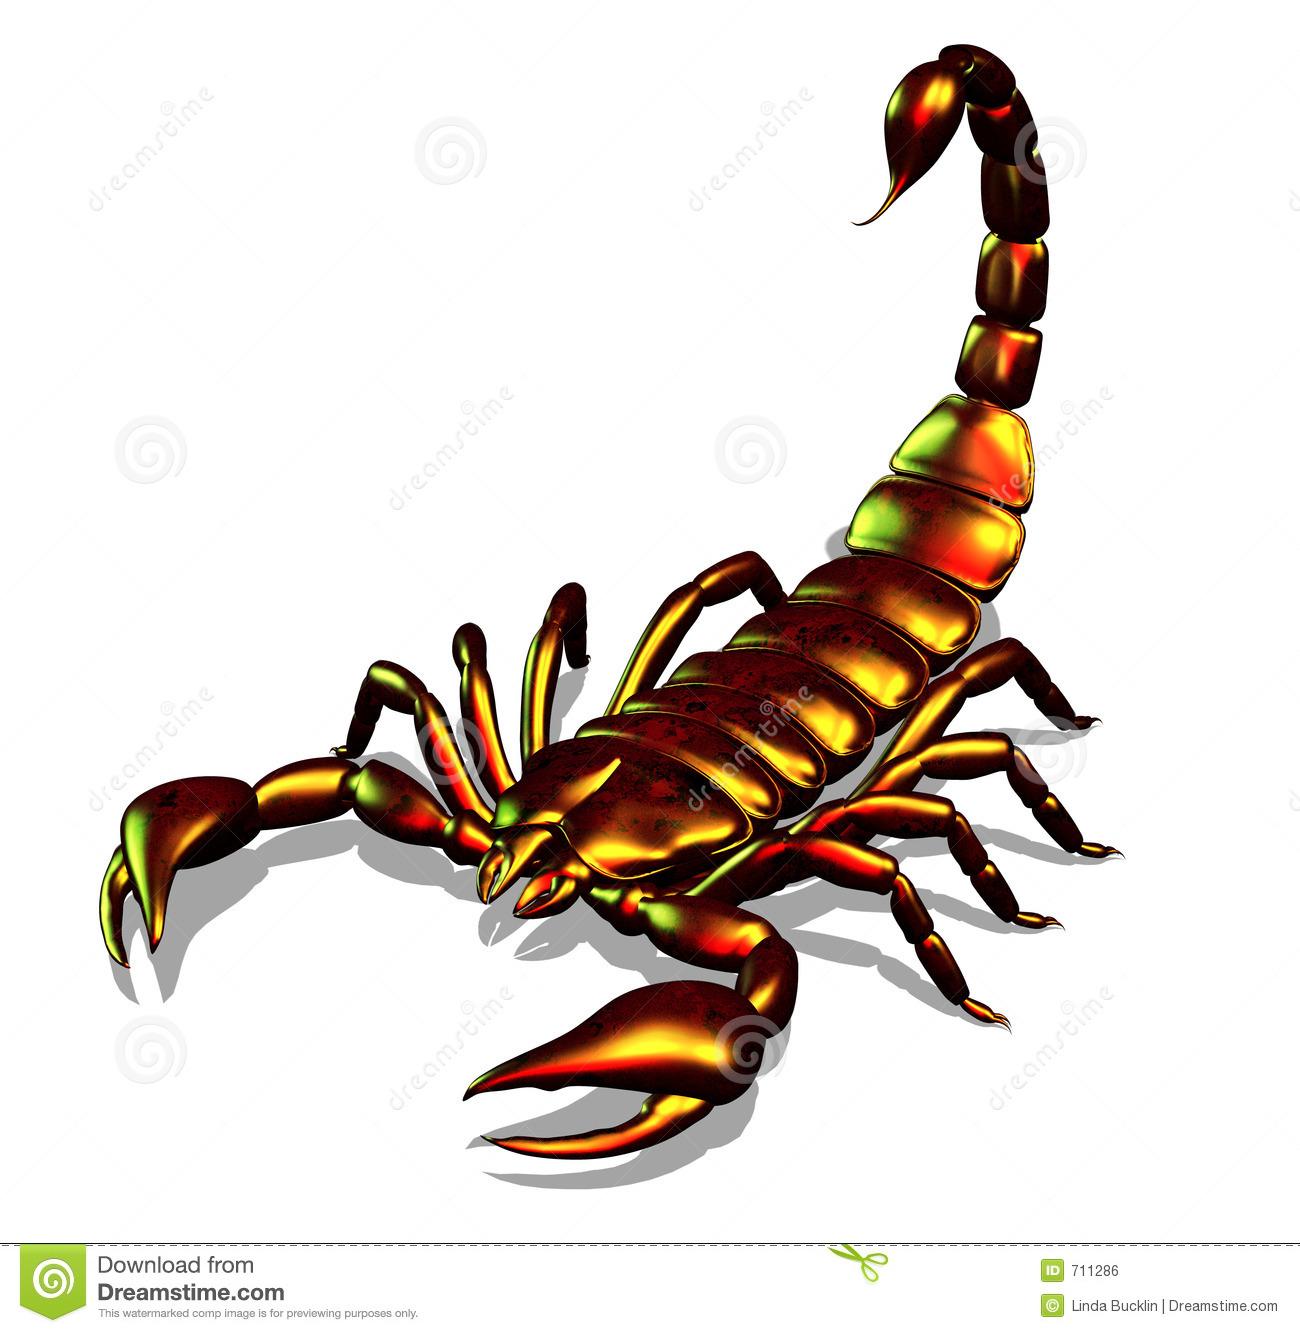 Scorpions clipart jpg transparent Scorpions Clip Art | Clipart Panda - Free Clipart Images jpg transparent